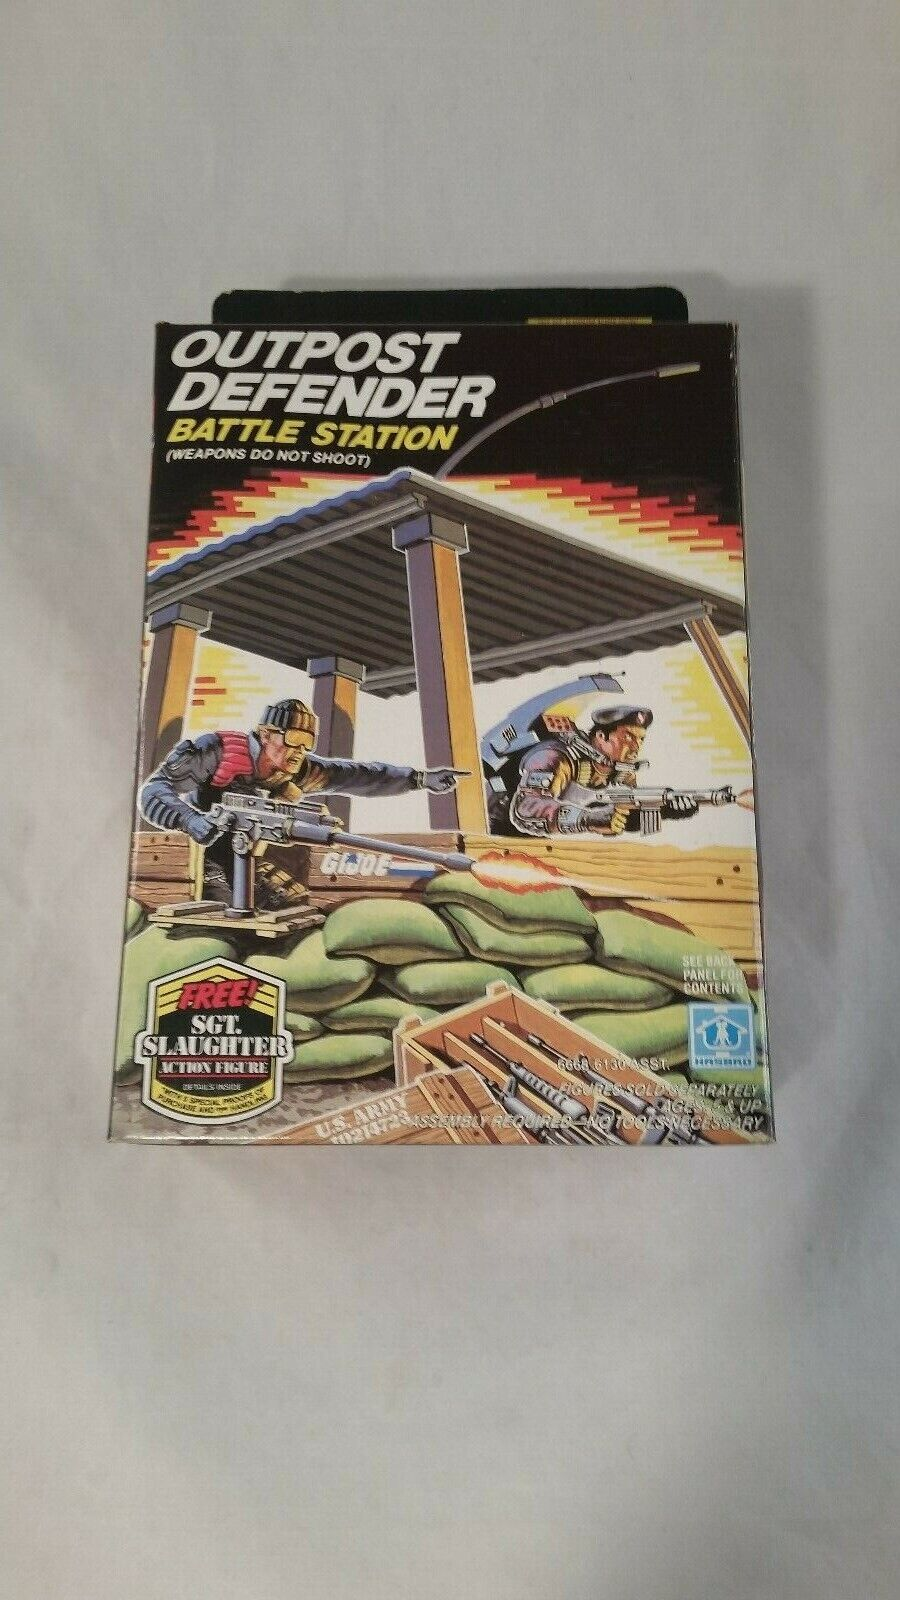 ARAH Hasbro GI JOE Outpost Defender battle Station ORIGINAL In Box 1986